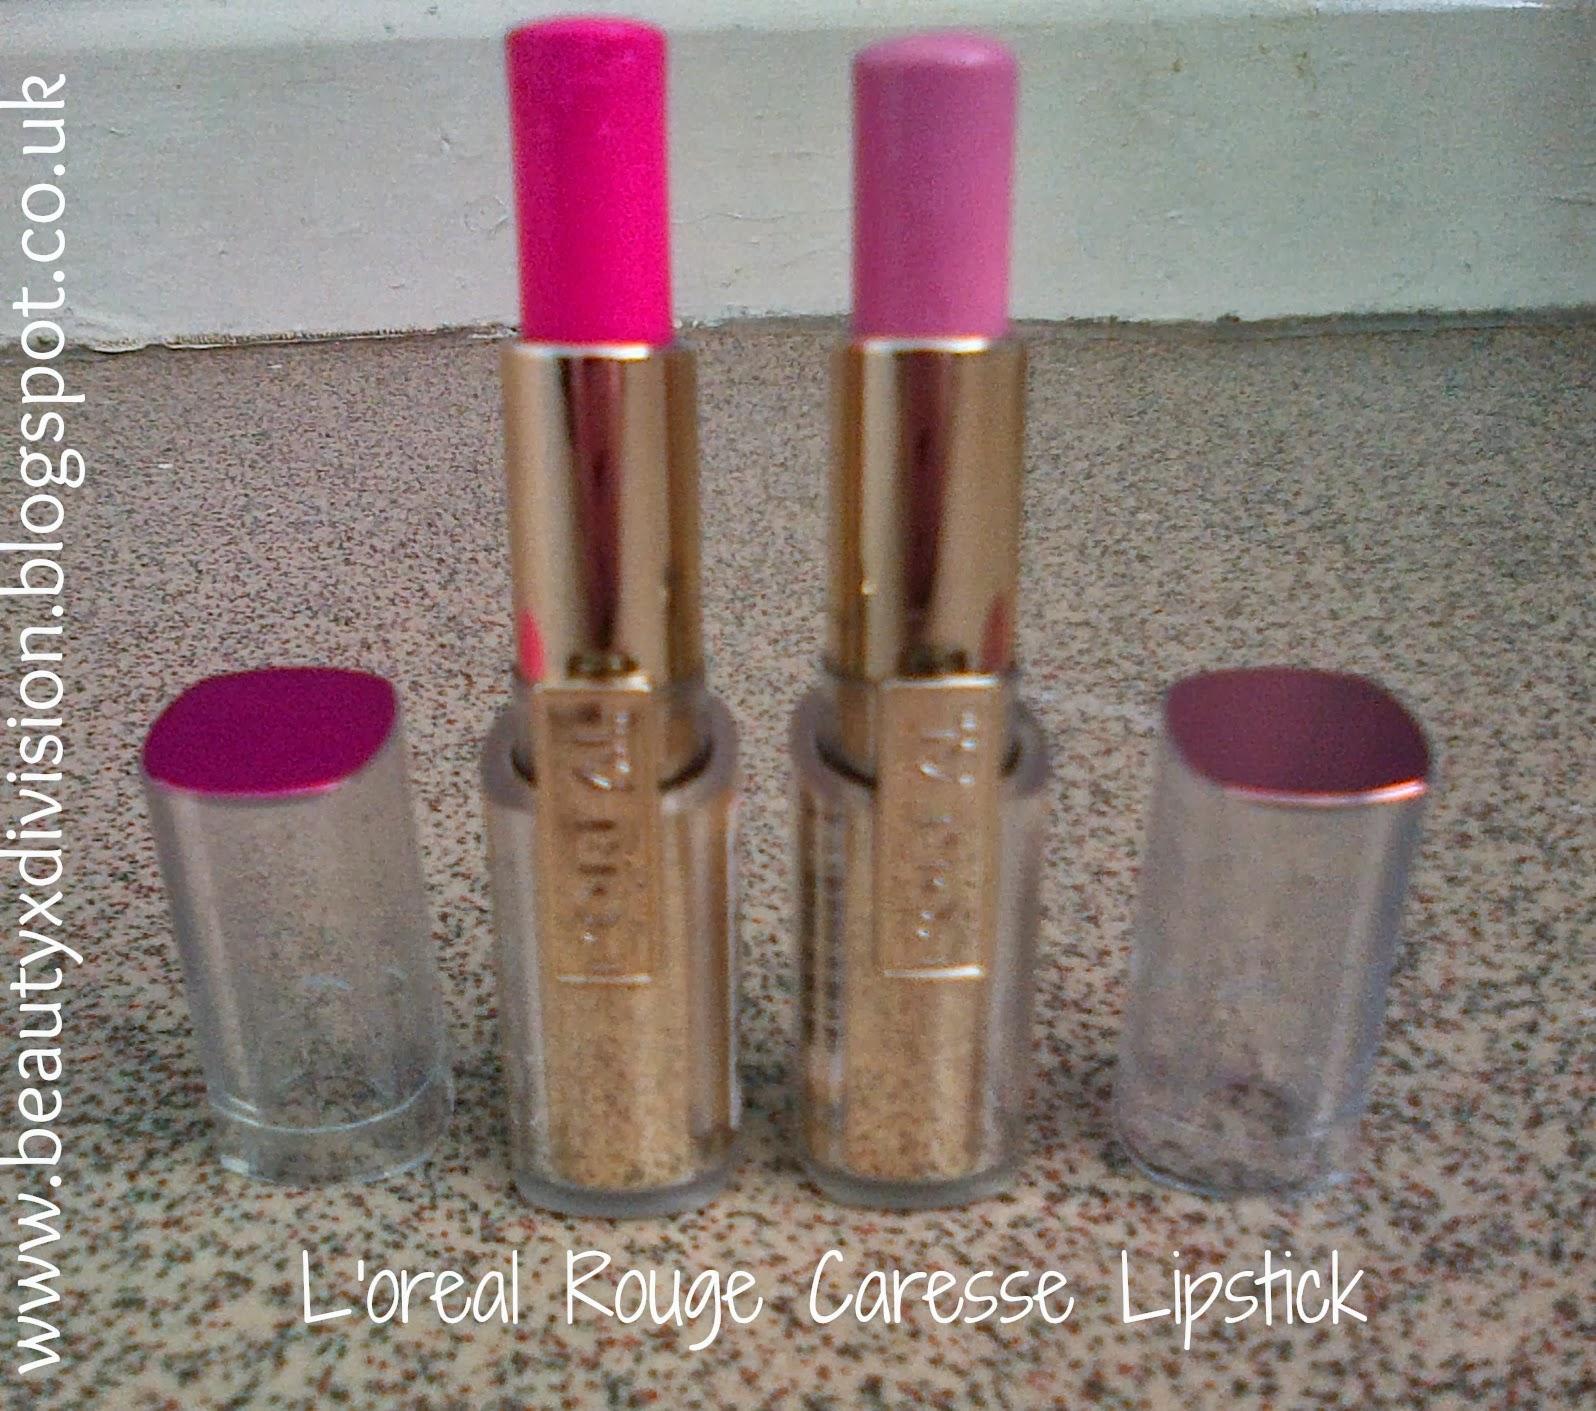 L'oreal Rouge Caresse Lipsticks